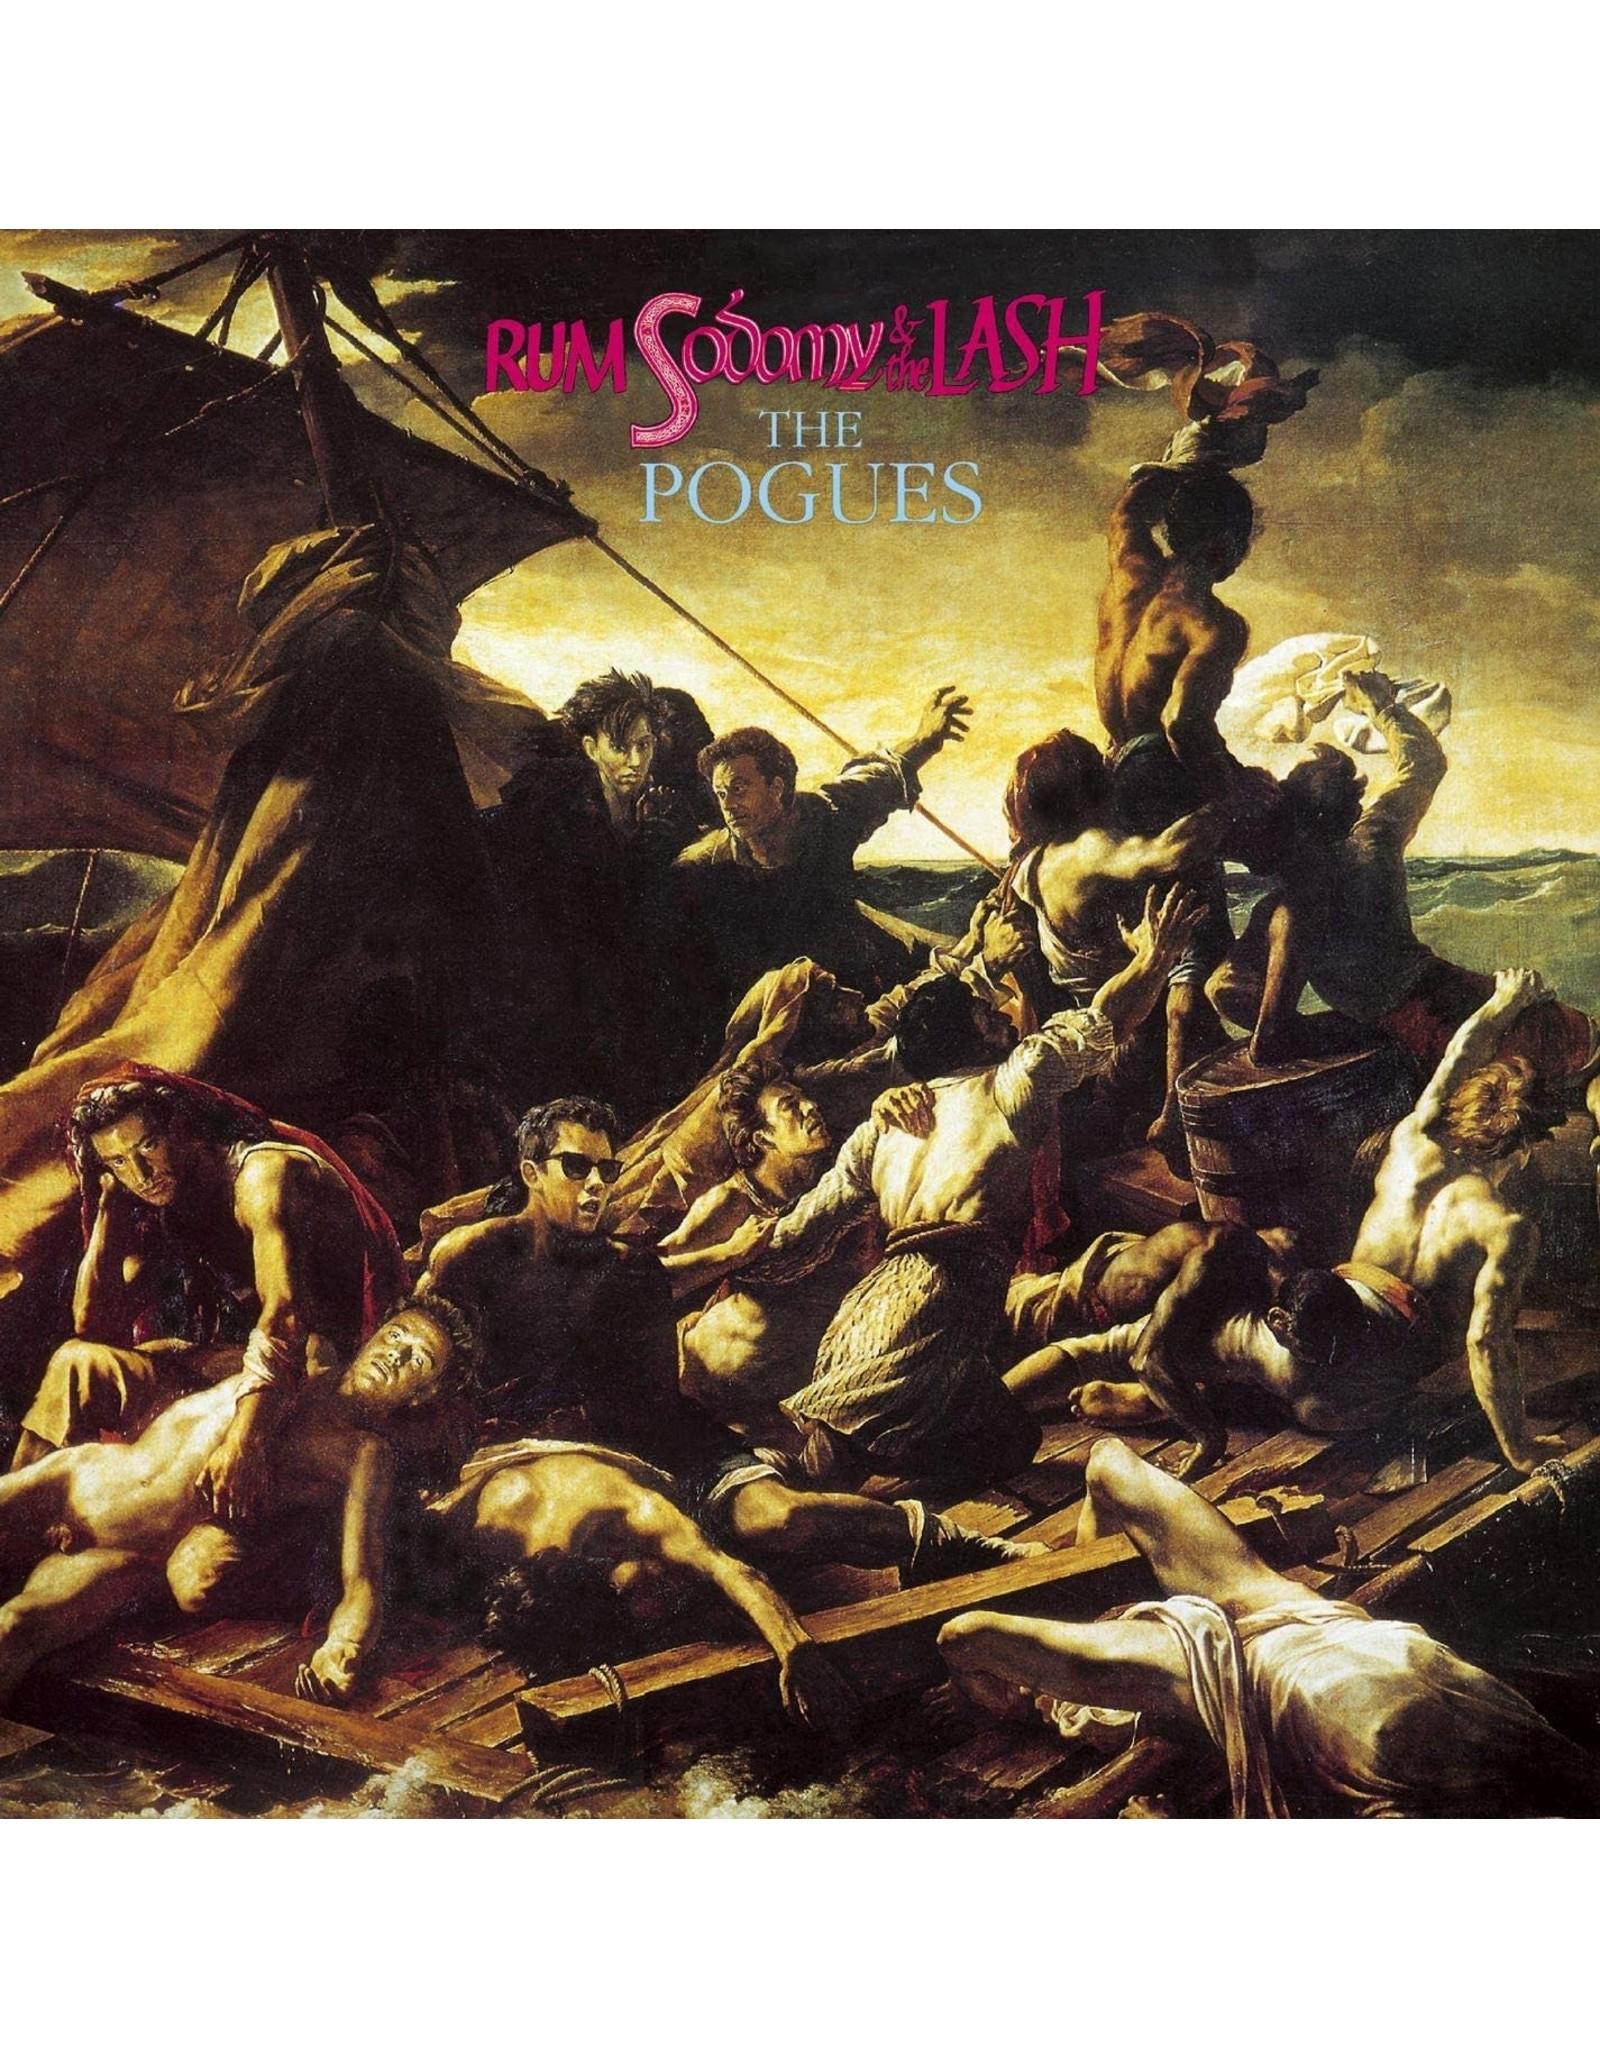 Pogues, The - Rum Sodomy & Lash 180G LP